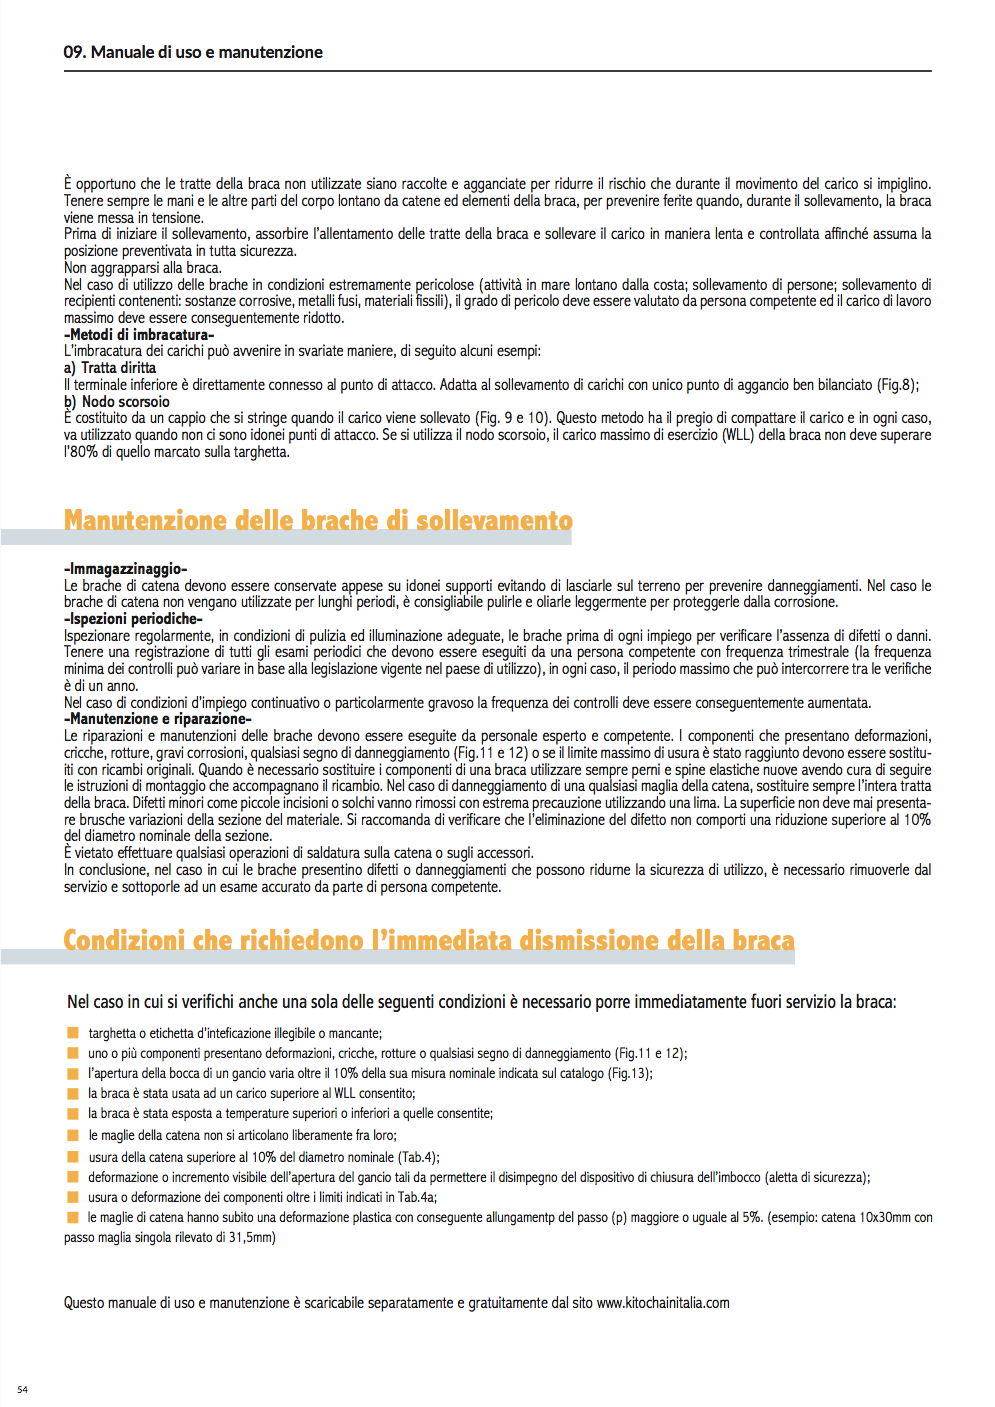 Manuale-uso-pag3